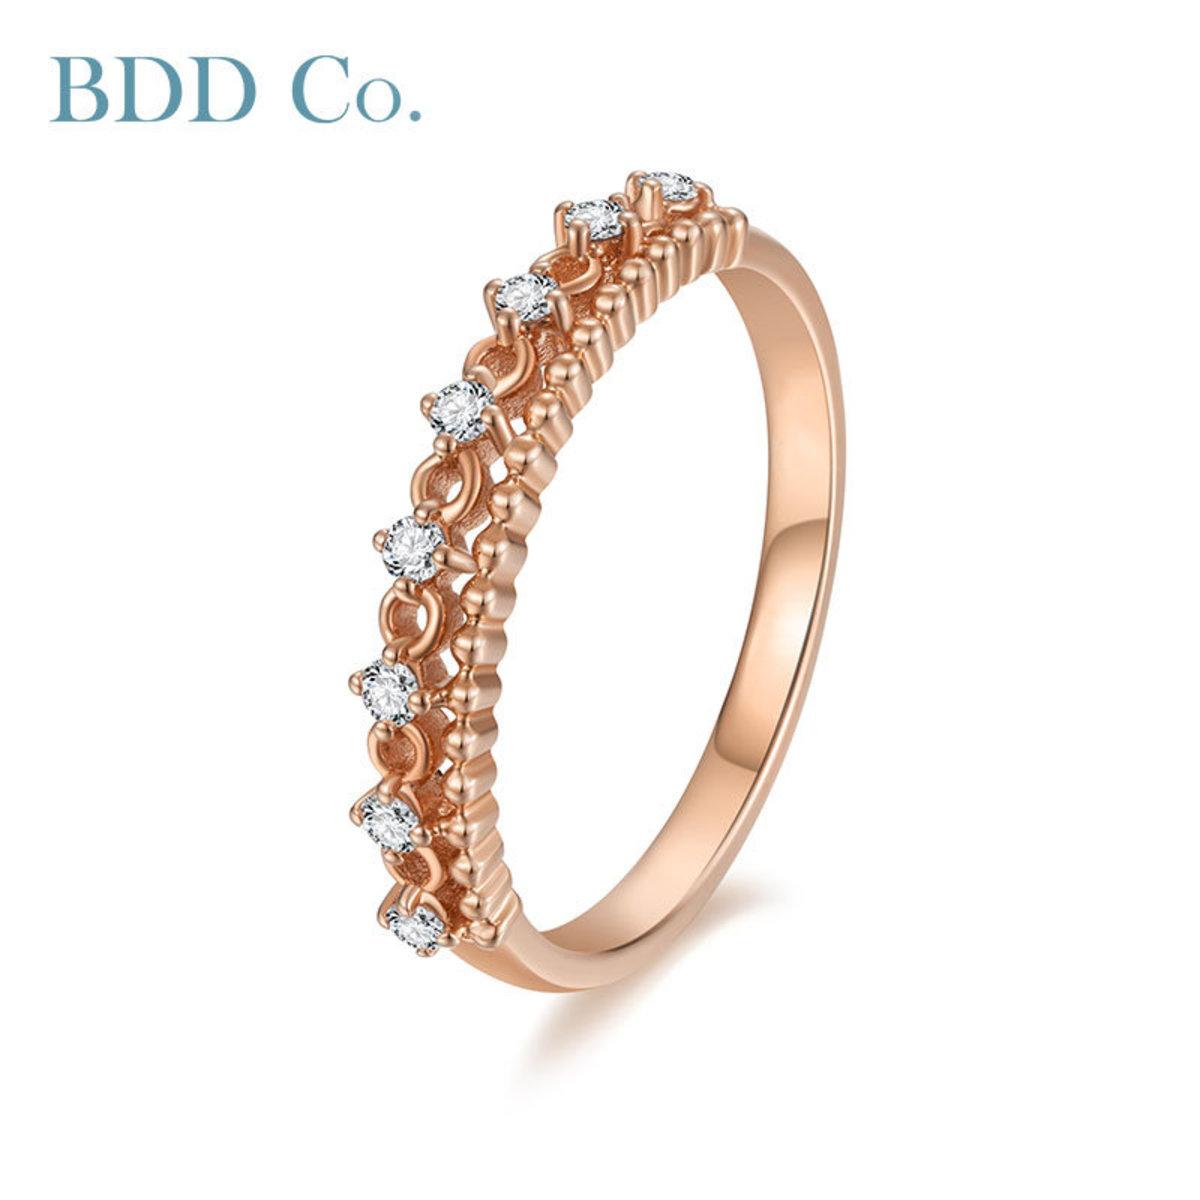 18K Rose Gold Classic Diamond Ring